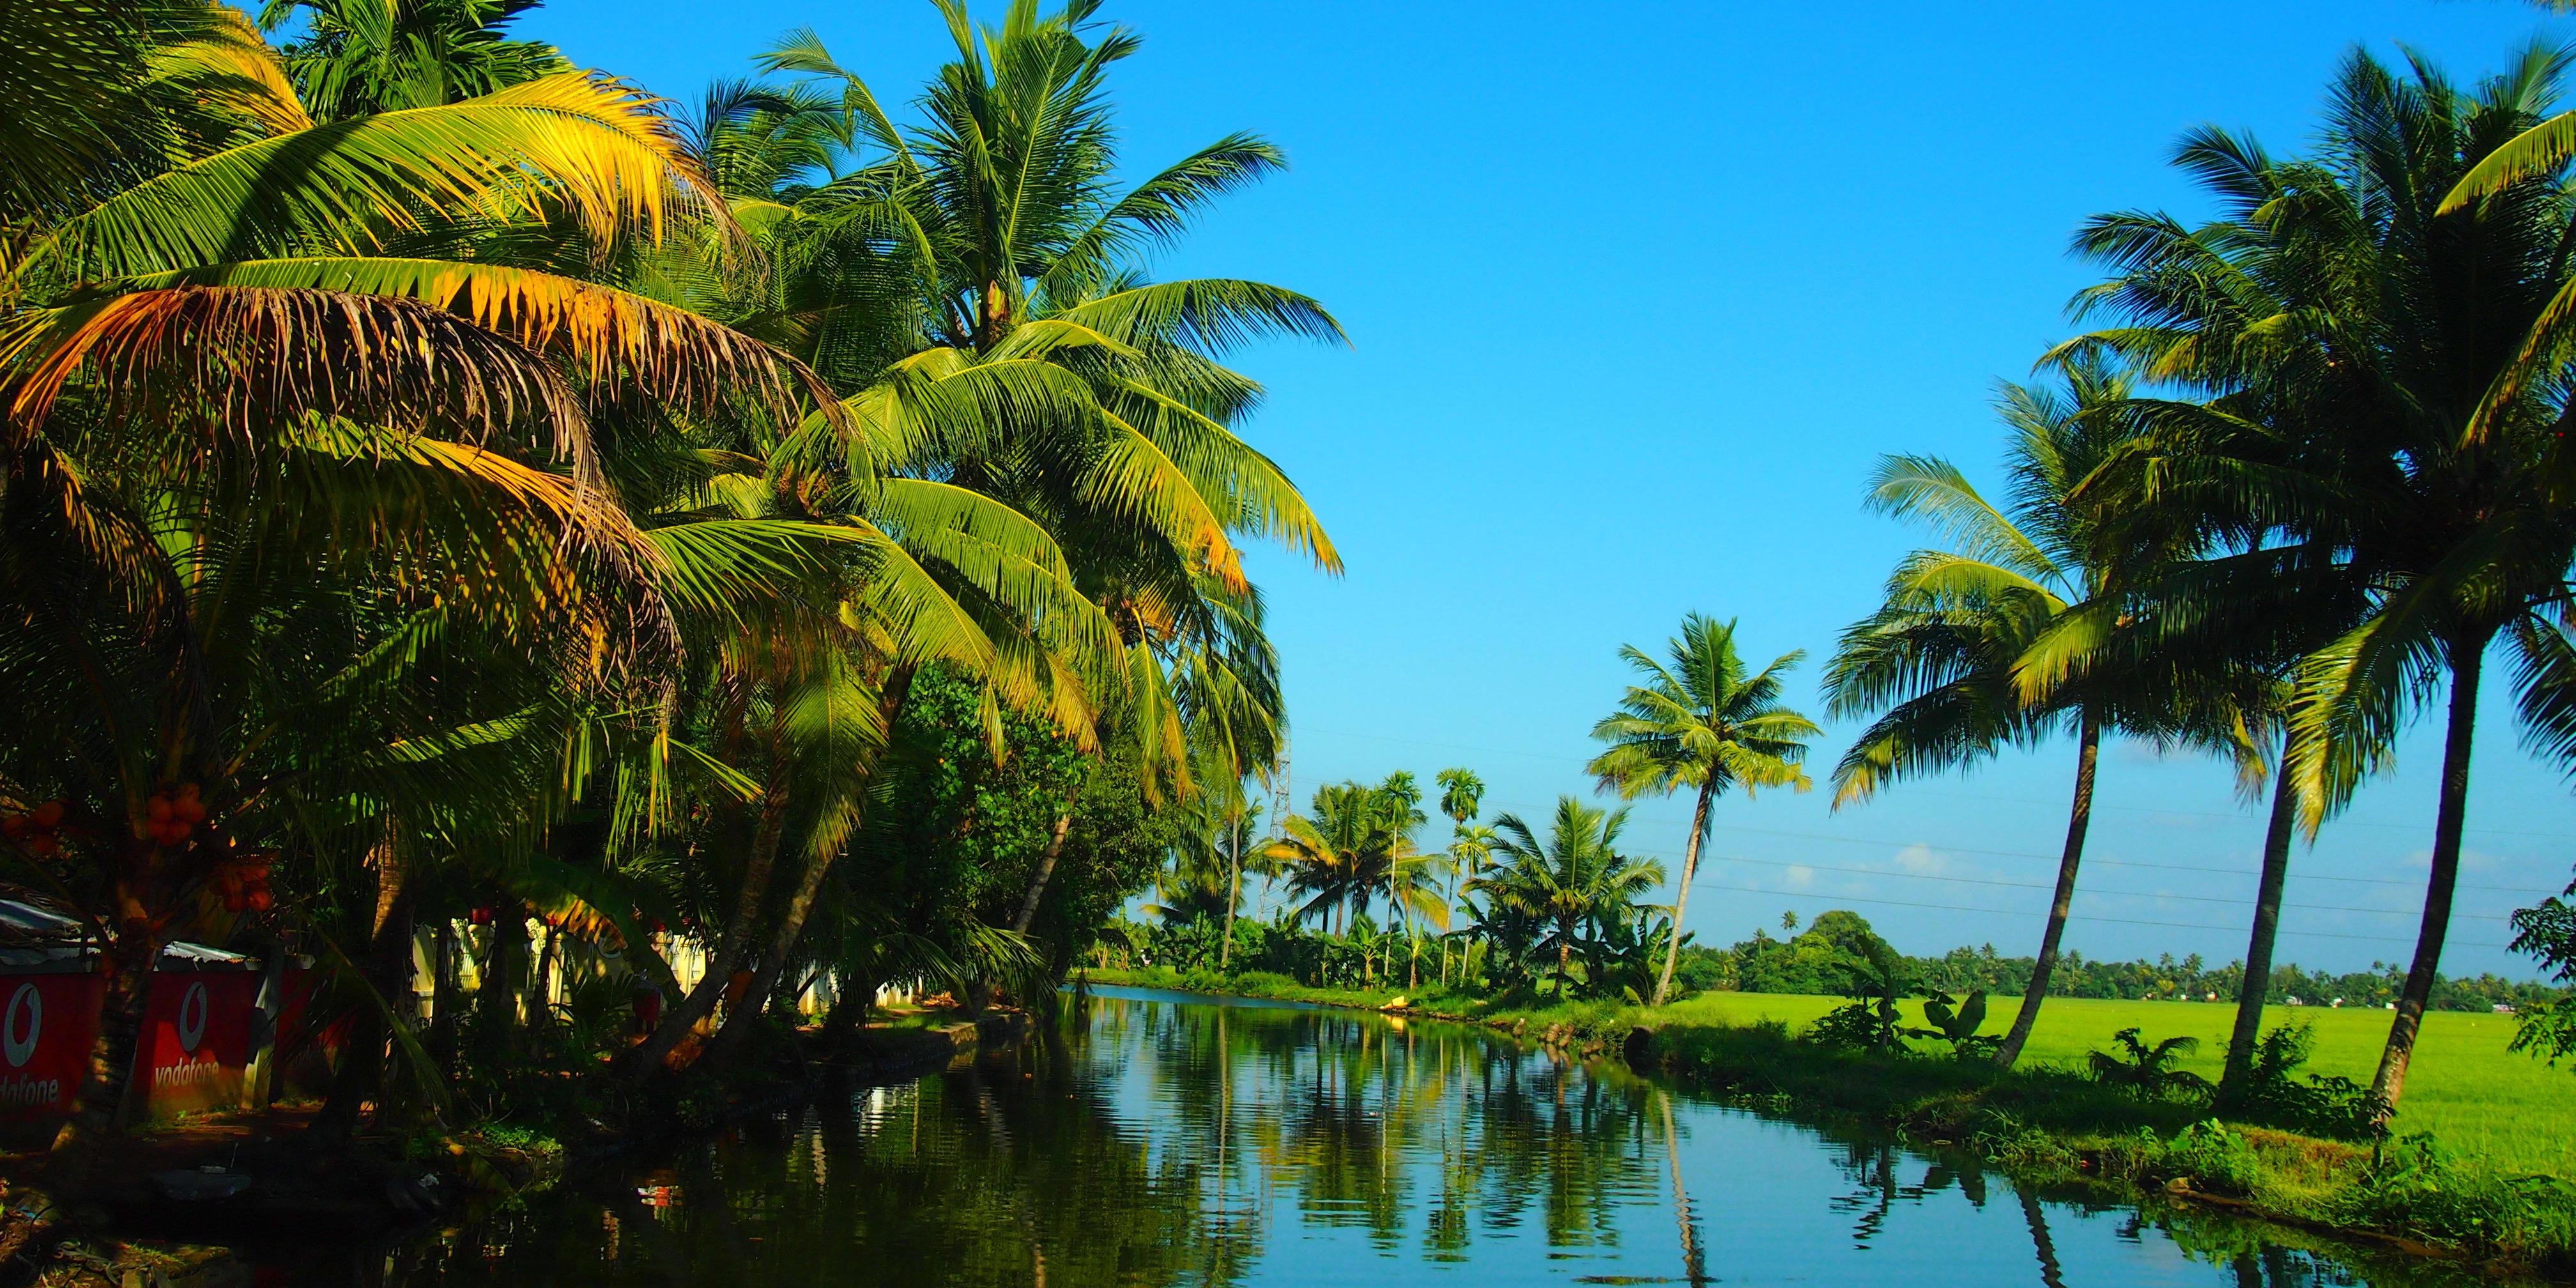 India Backwater